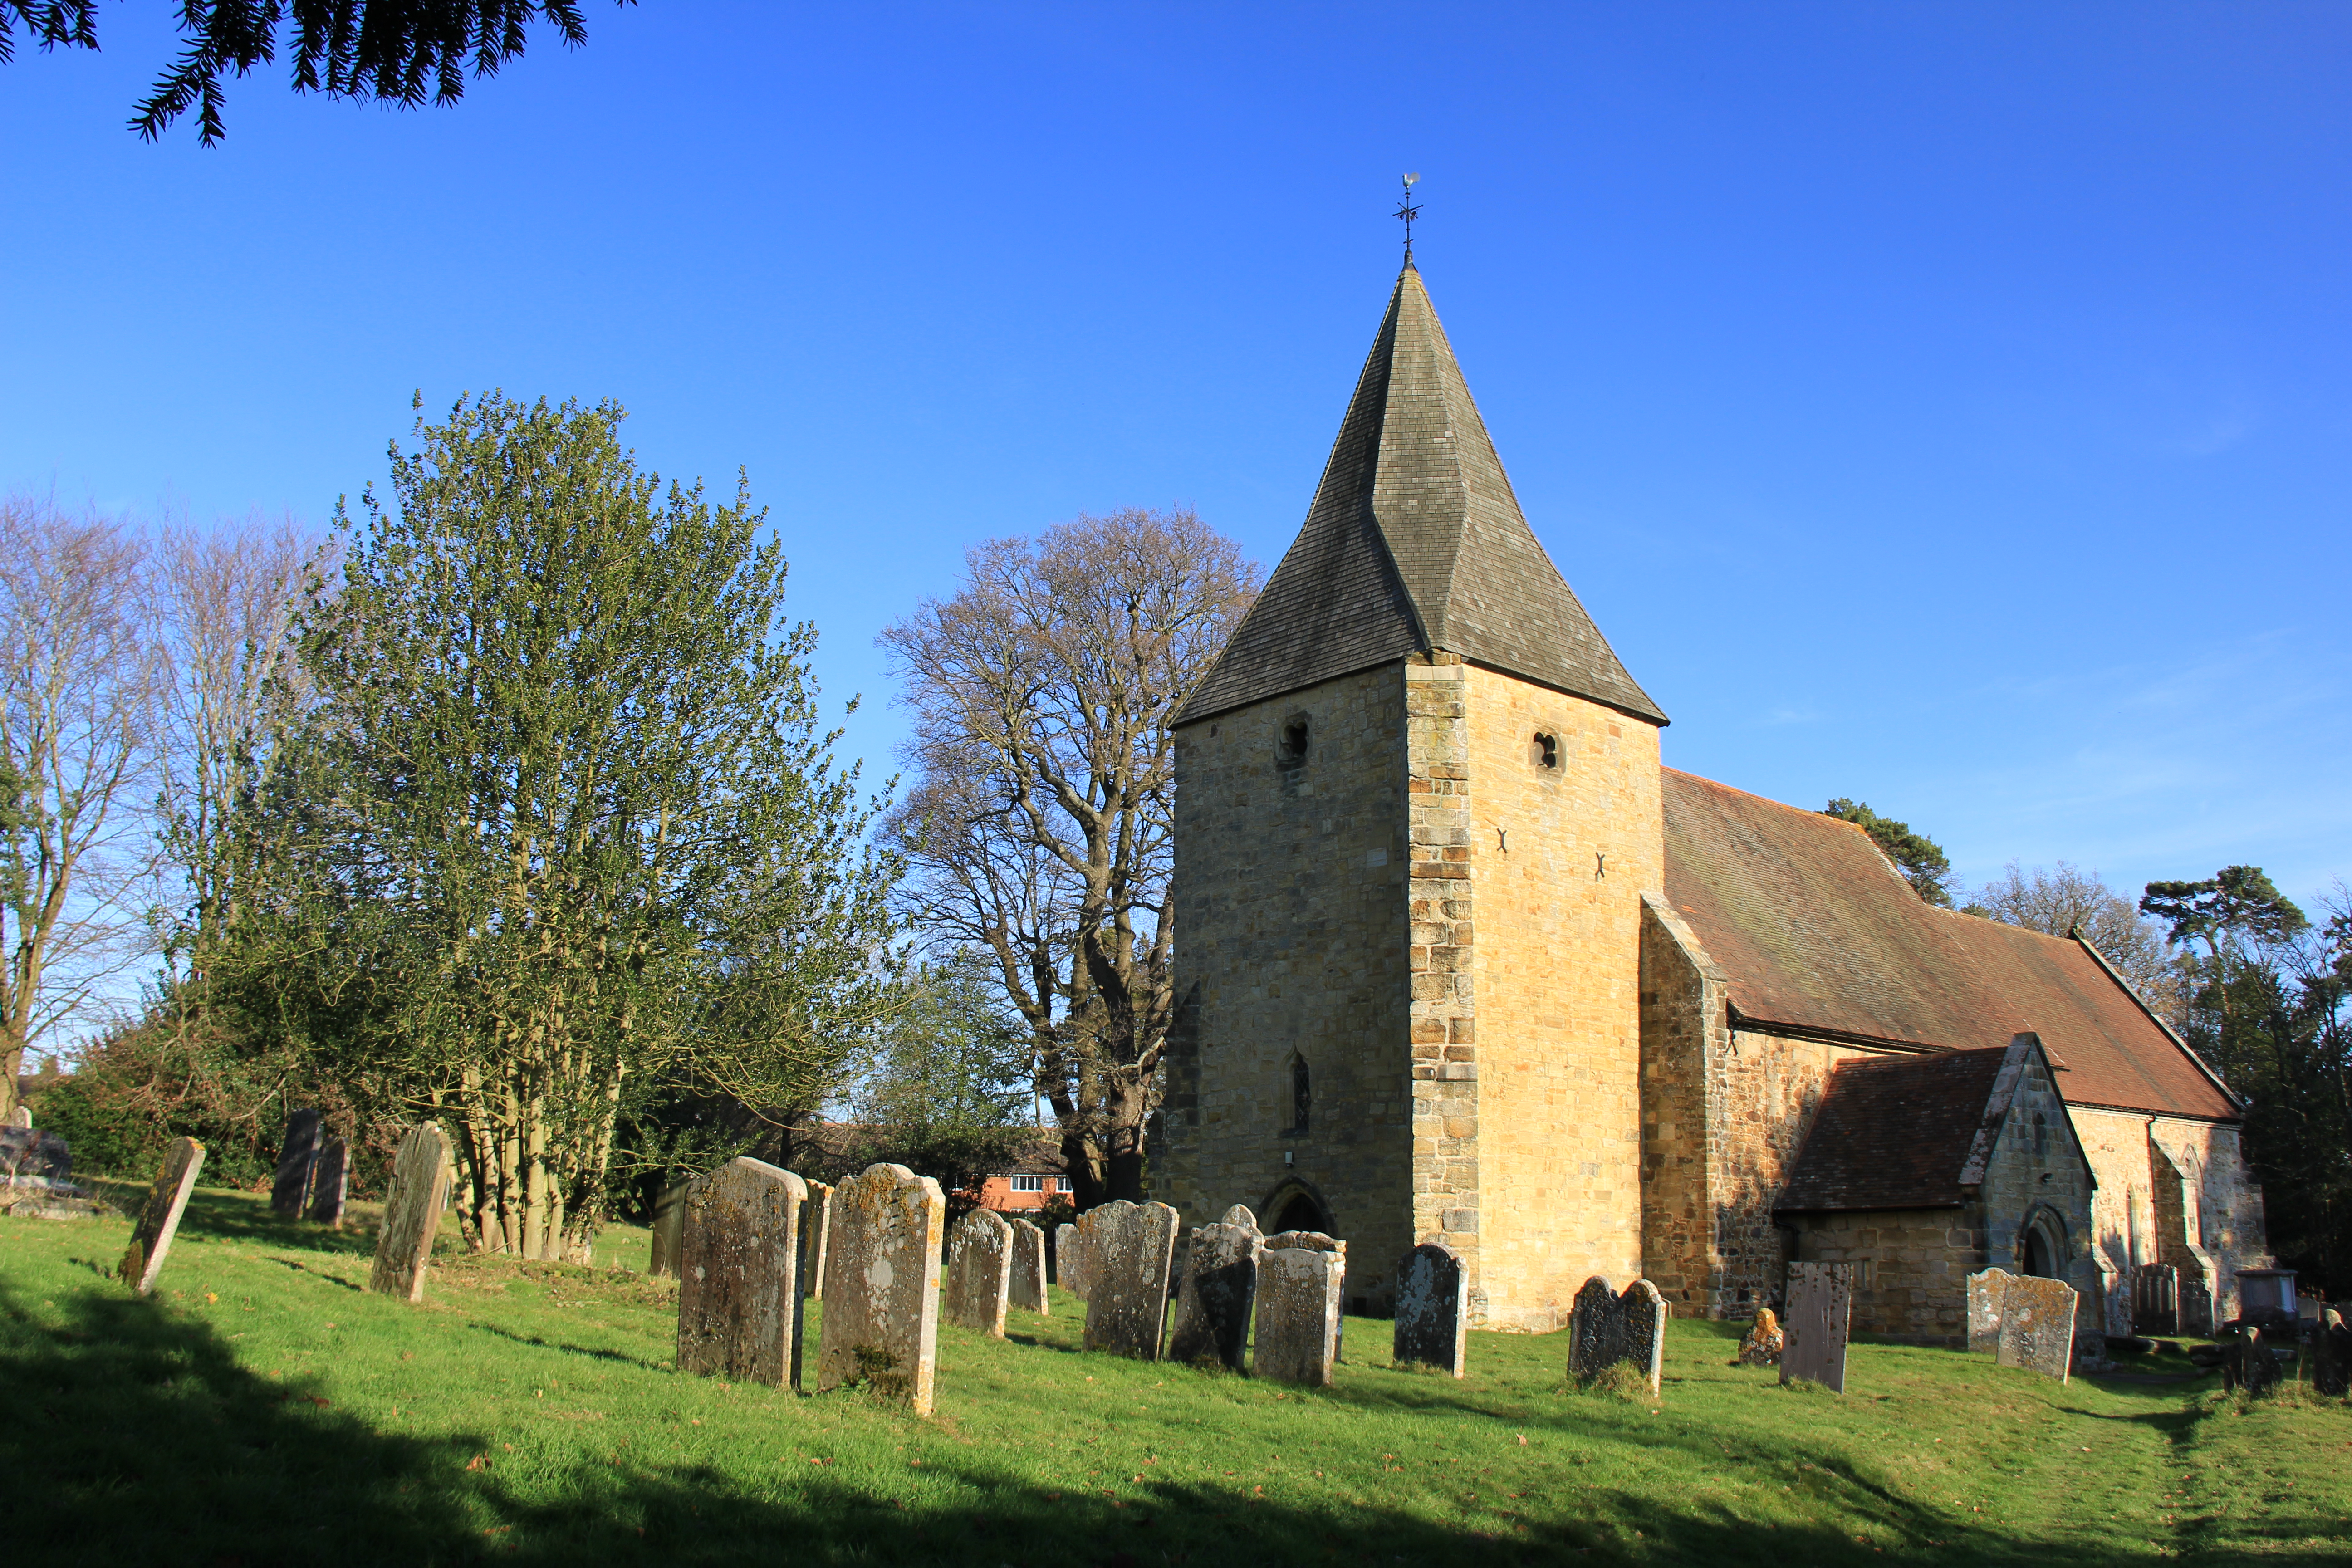 Old Church in the sunshine